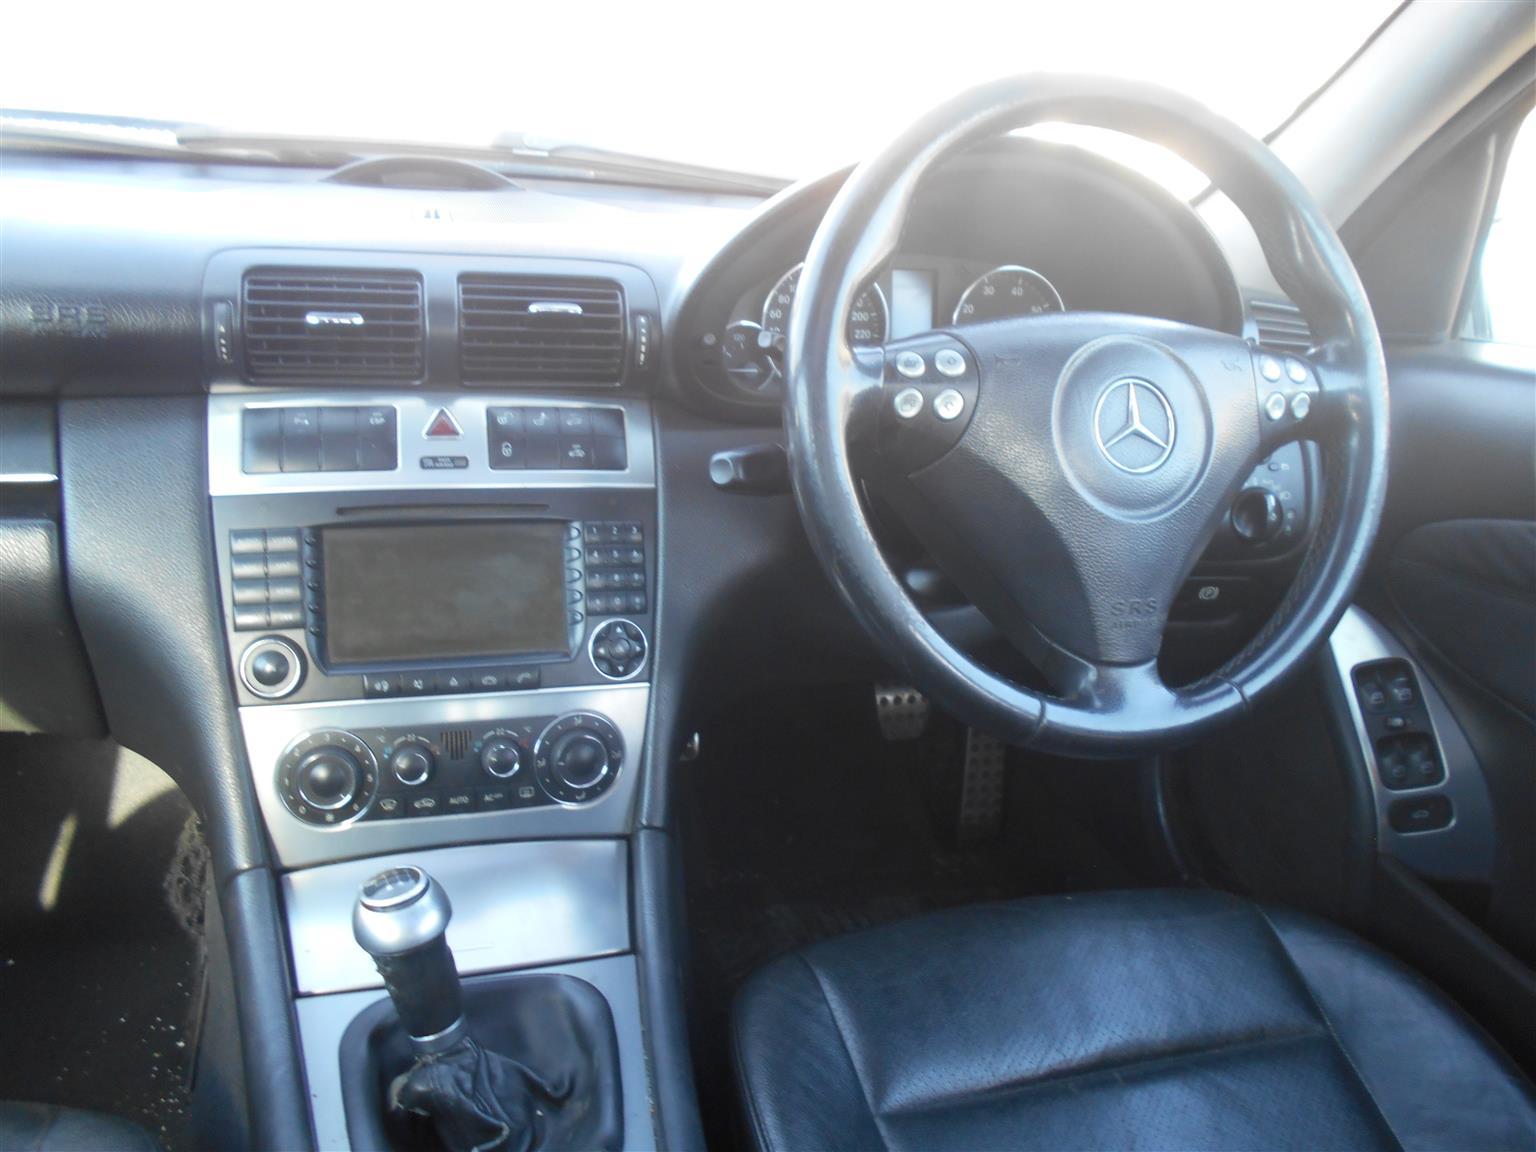 Mercedes Benz C200 Kompressor Stripping For Spares